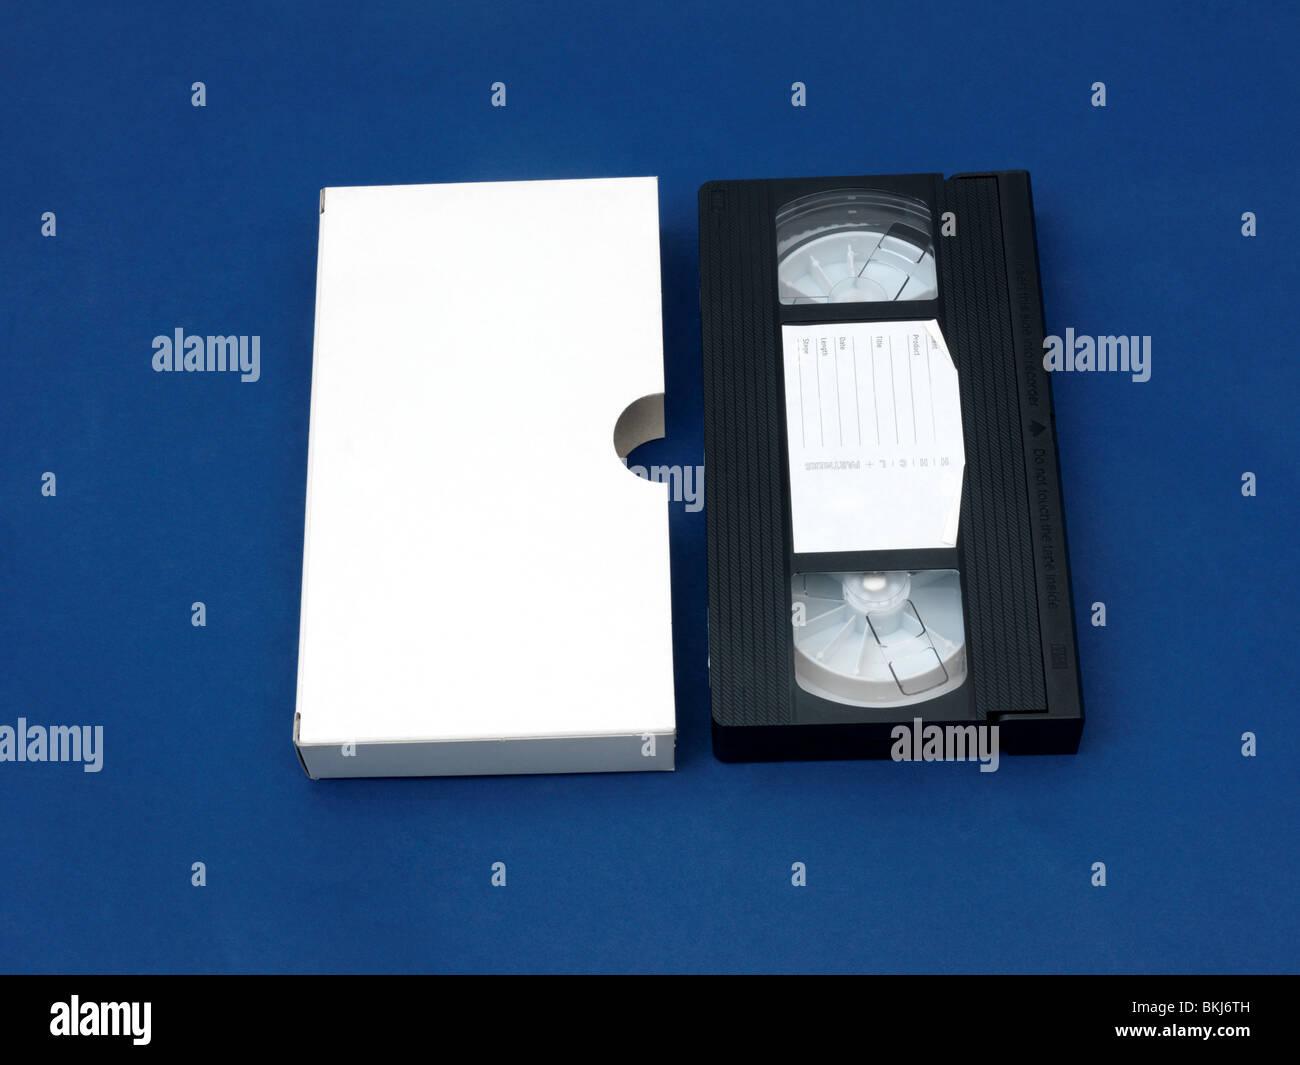 Blank Video Cassette With Cardboard Slide In Case - Stock Image